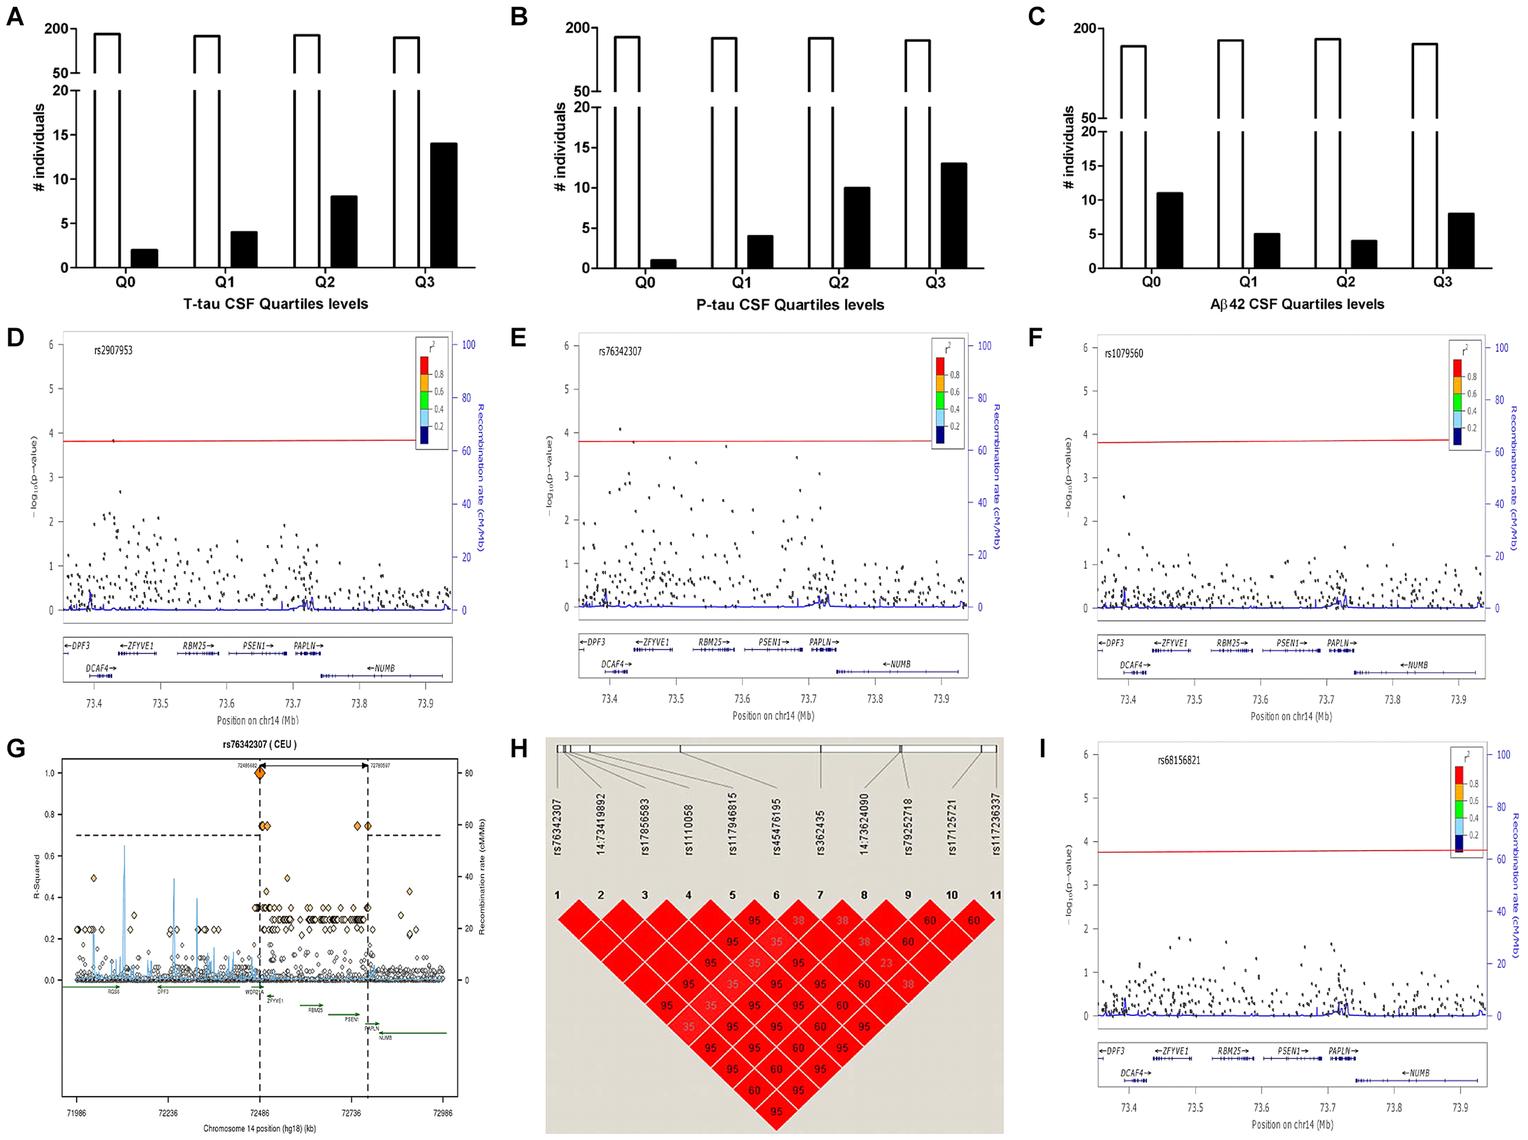 Distribution of <i>PSEN1</i> p.E318G mutation carriers in CSF Biomarker quartiles.